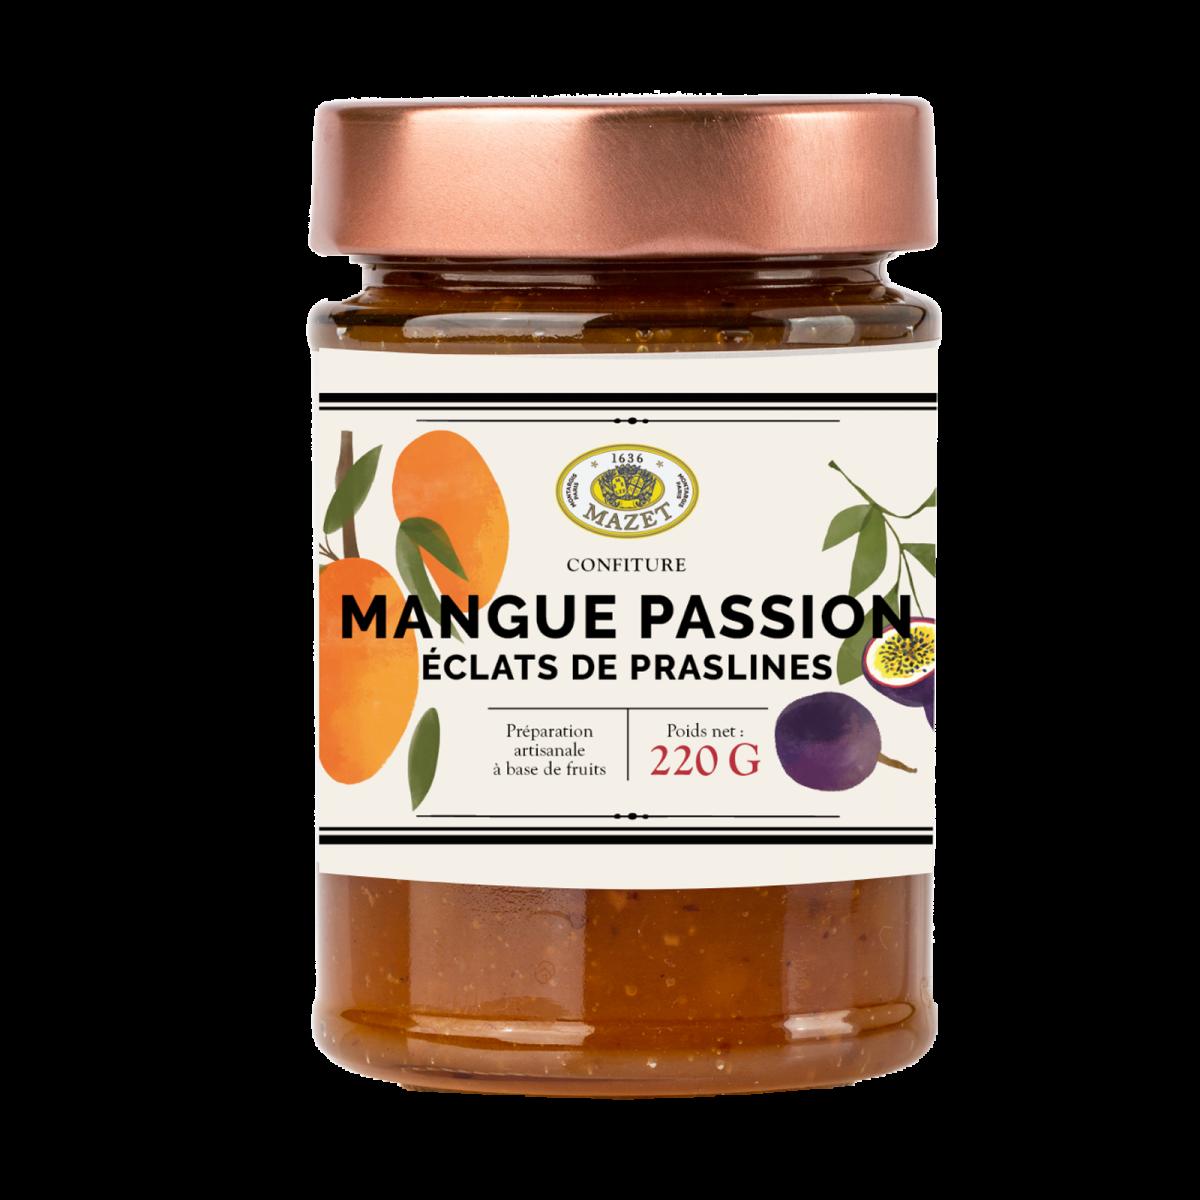 Confitures - Confiture mangue passion Praslines (pralines)...